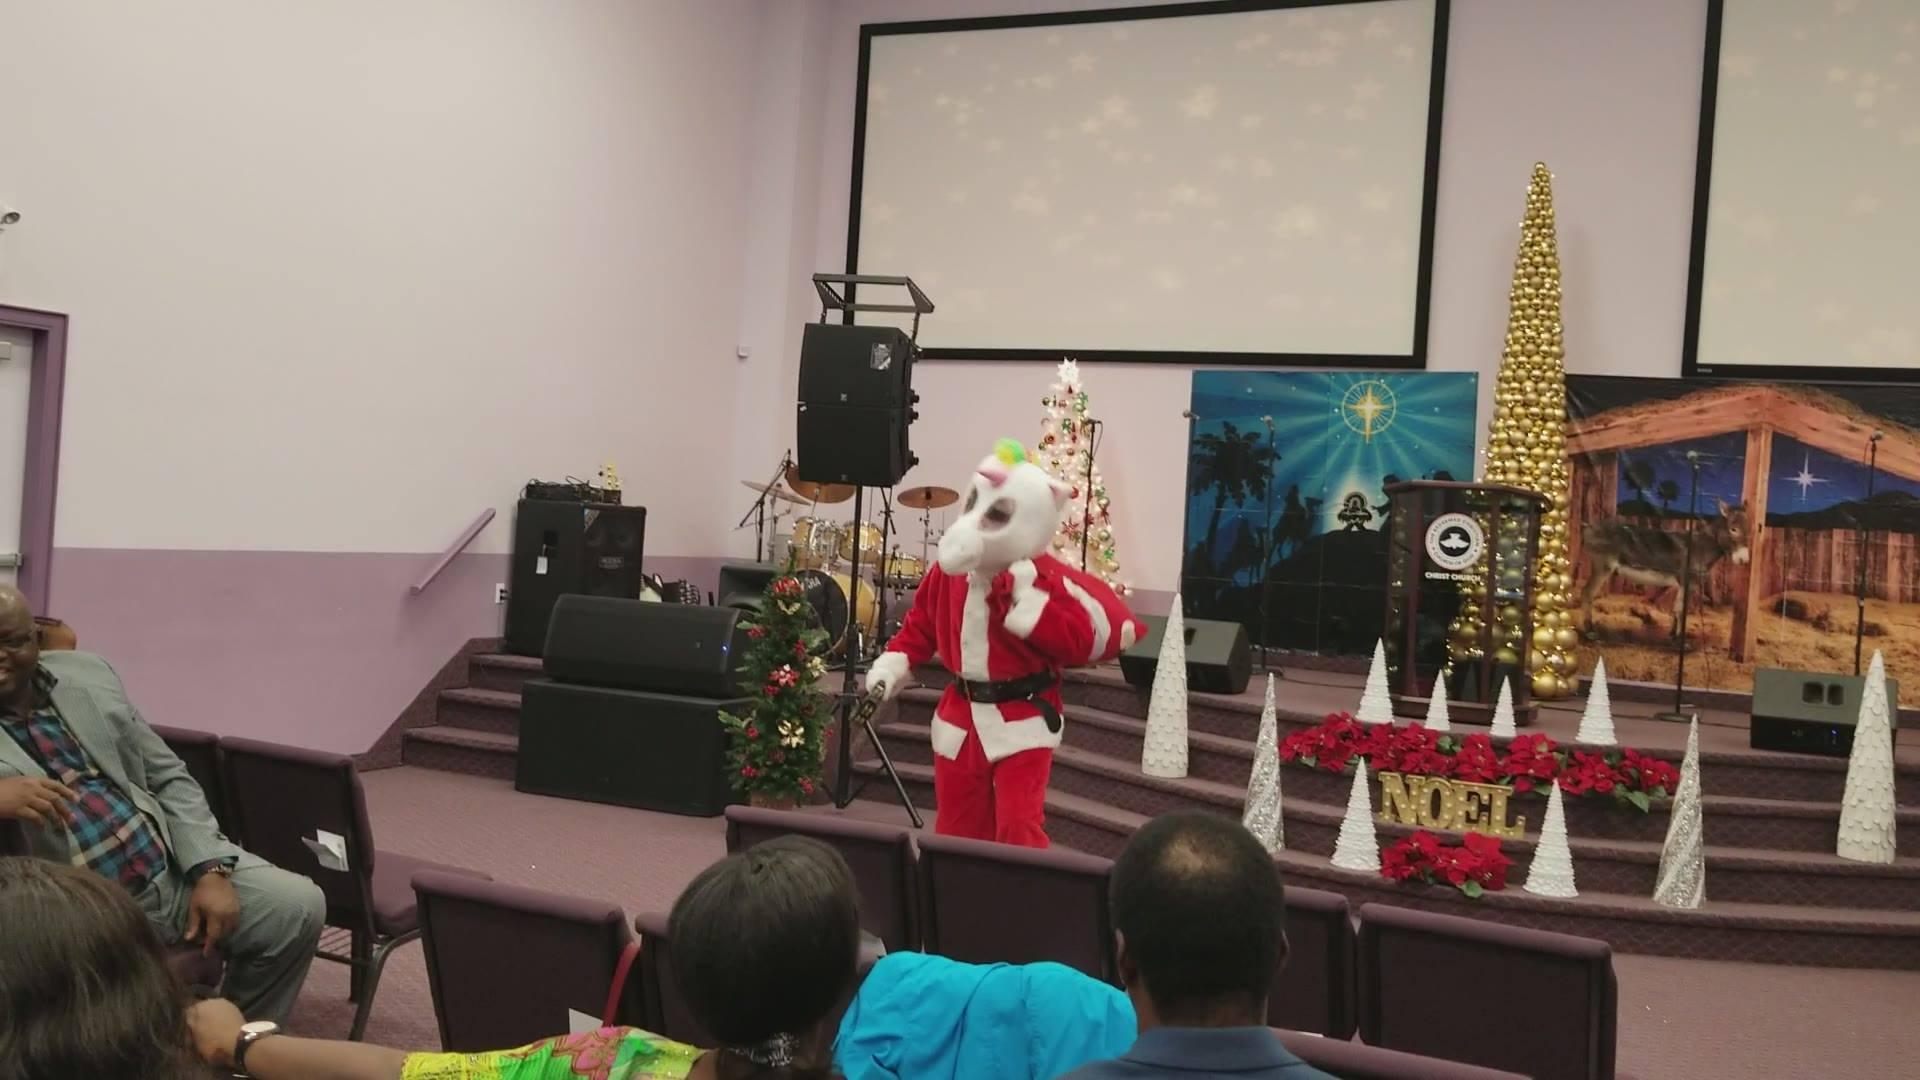 #MerryChristmas from RCCG Christ Church Edmonton